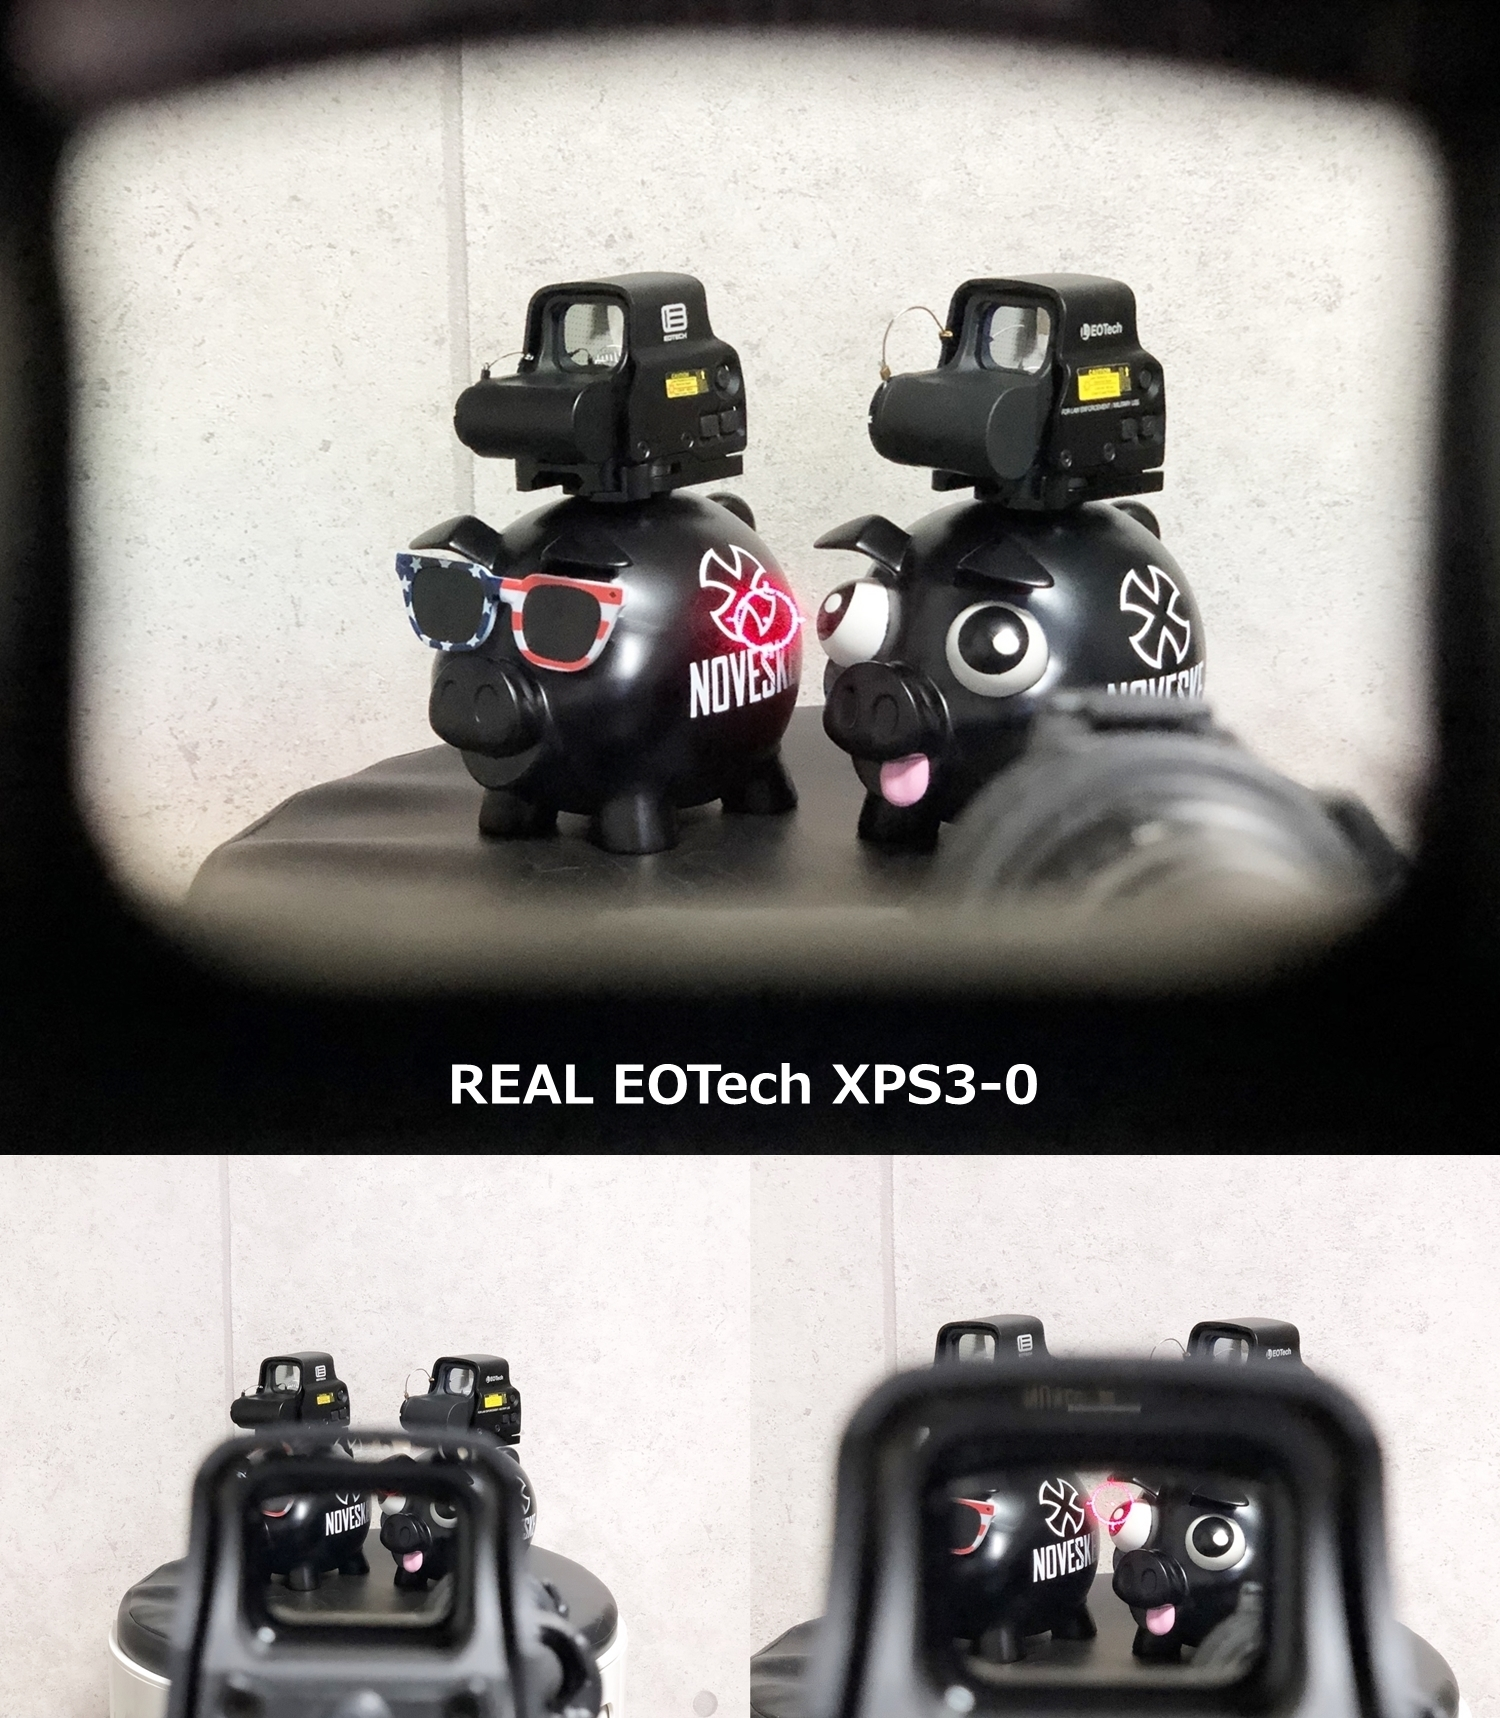 18 EVOLUTION GEAR EOTech EXPS3-0!! 実物 & エボギア & NO BRAND レンズの違い検証!! DEVTRON SCOPECOAT ホロサイト カバー装着!! NOVESKE PIG の仲間が増えました!! 開封 検証 取付 レビュー!!